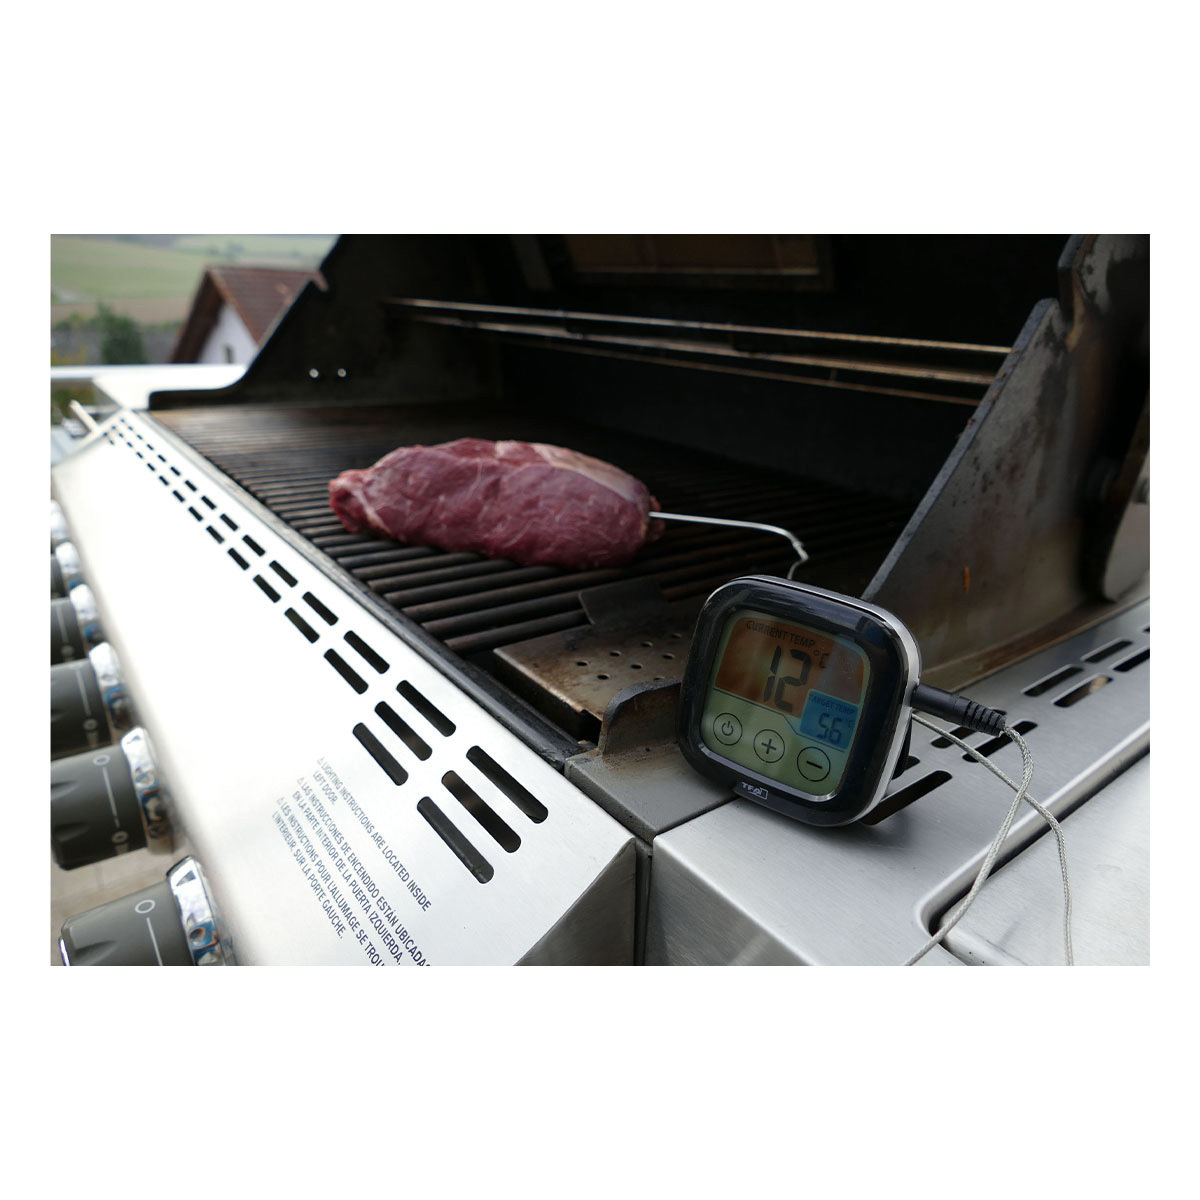 14-1509-01-digitales-grill-bratenthermometer-anwendung1-1200x1200px.jpg